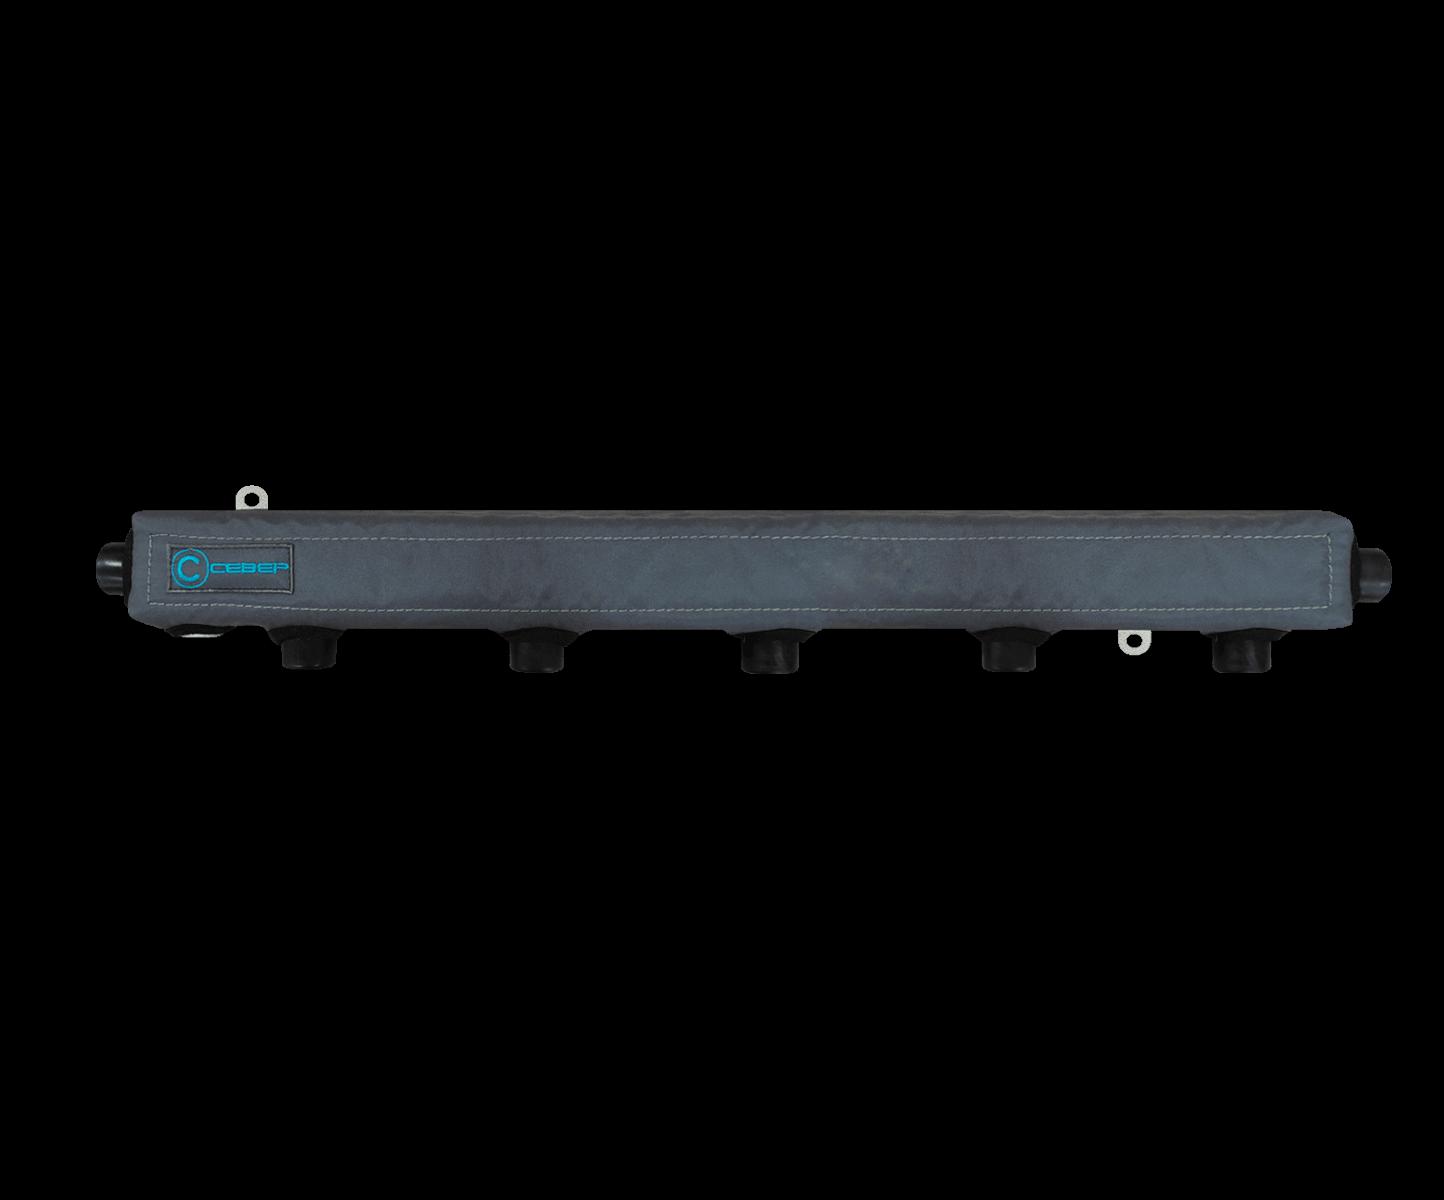 Теплоизоляция, теплоизоляционный чехол для гидрообвязки Север К5